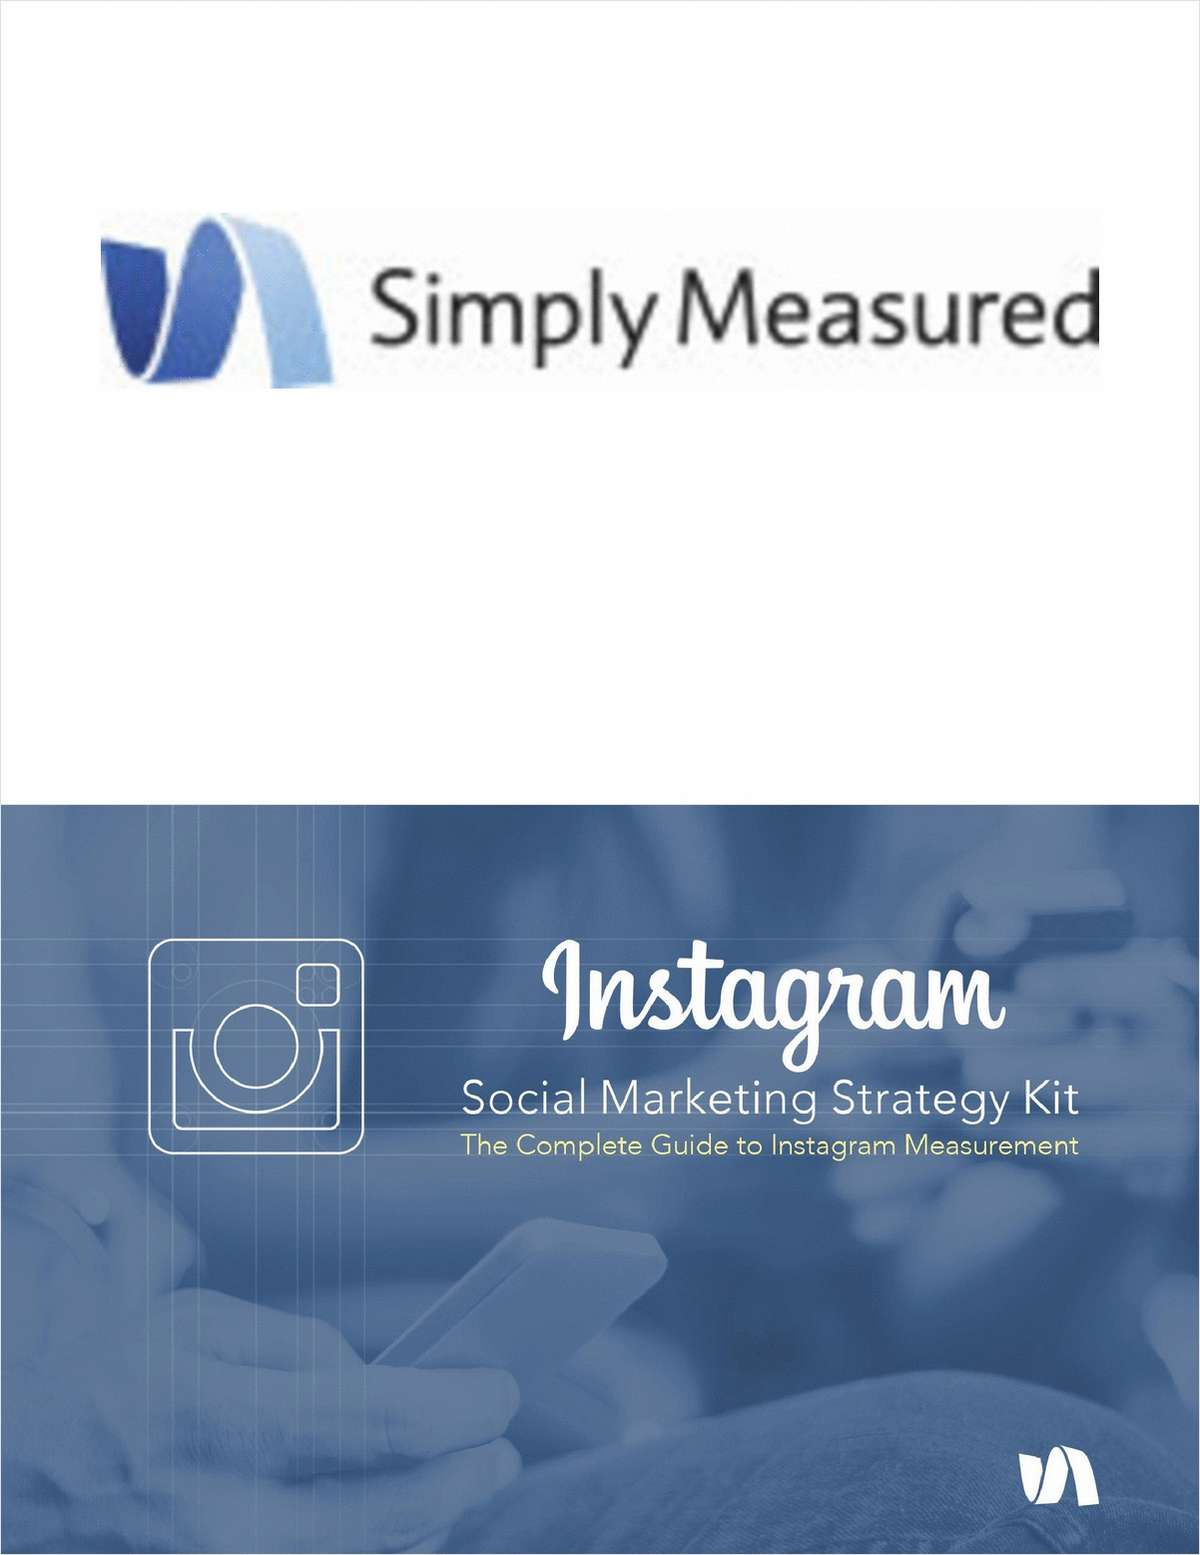 Instagram Social Marketing Strategy Kit